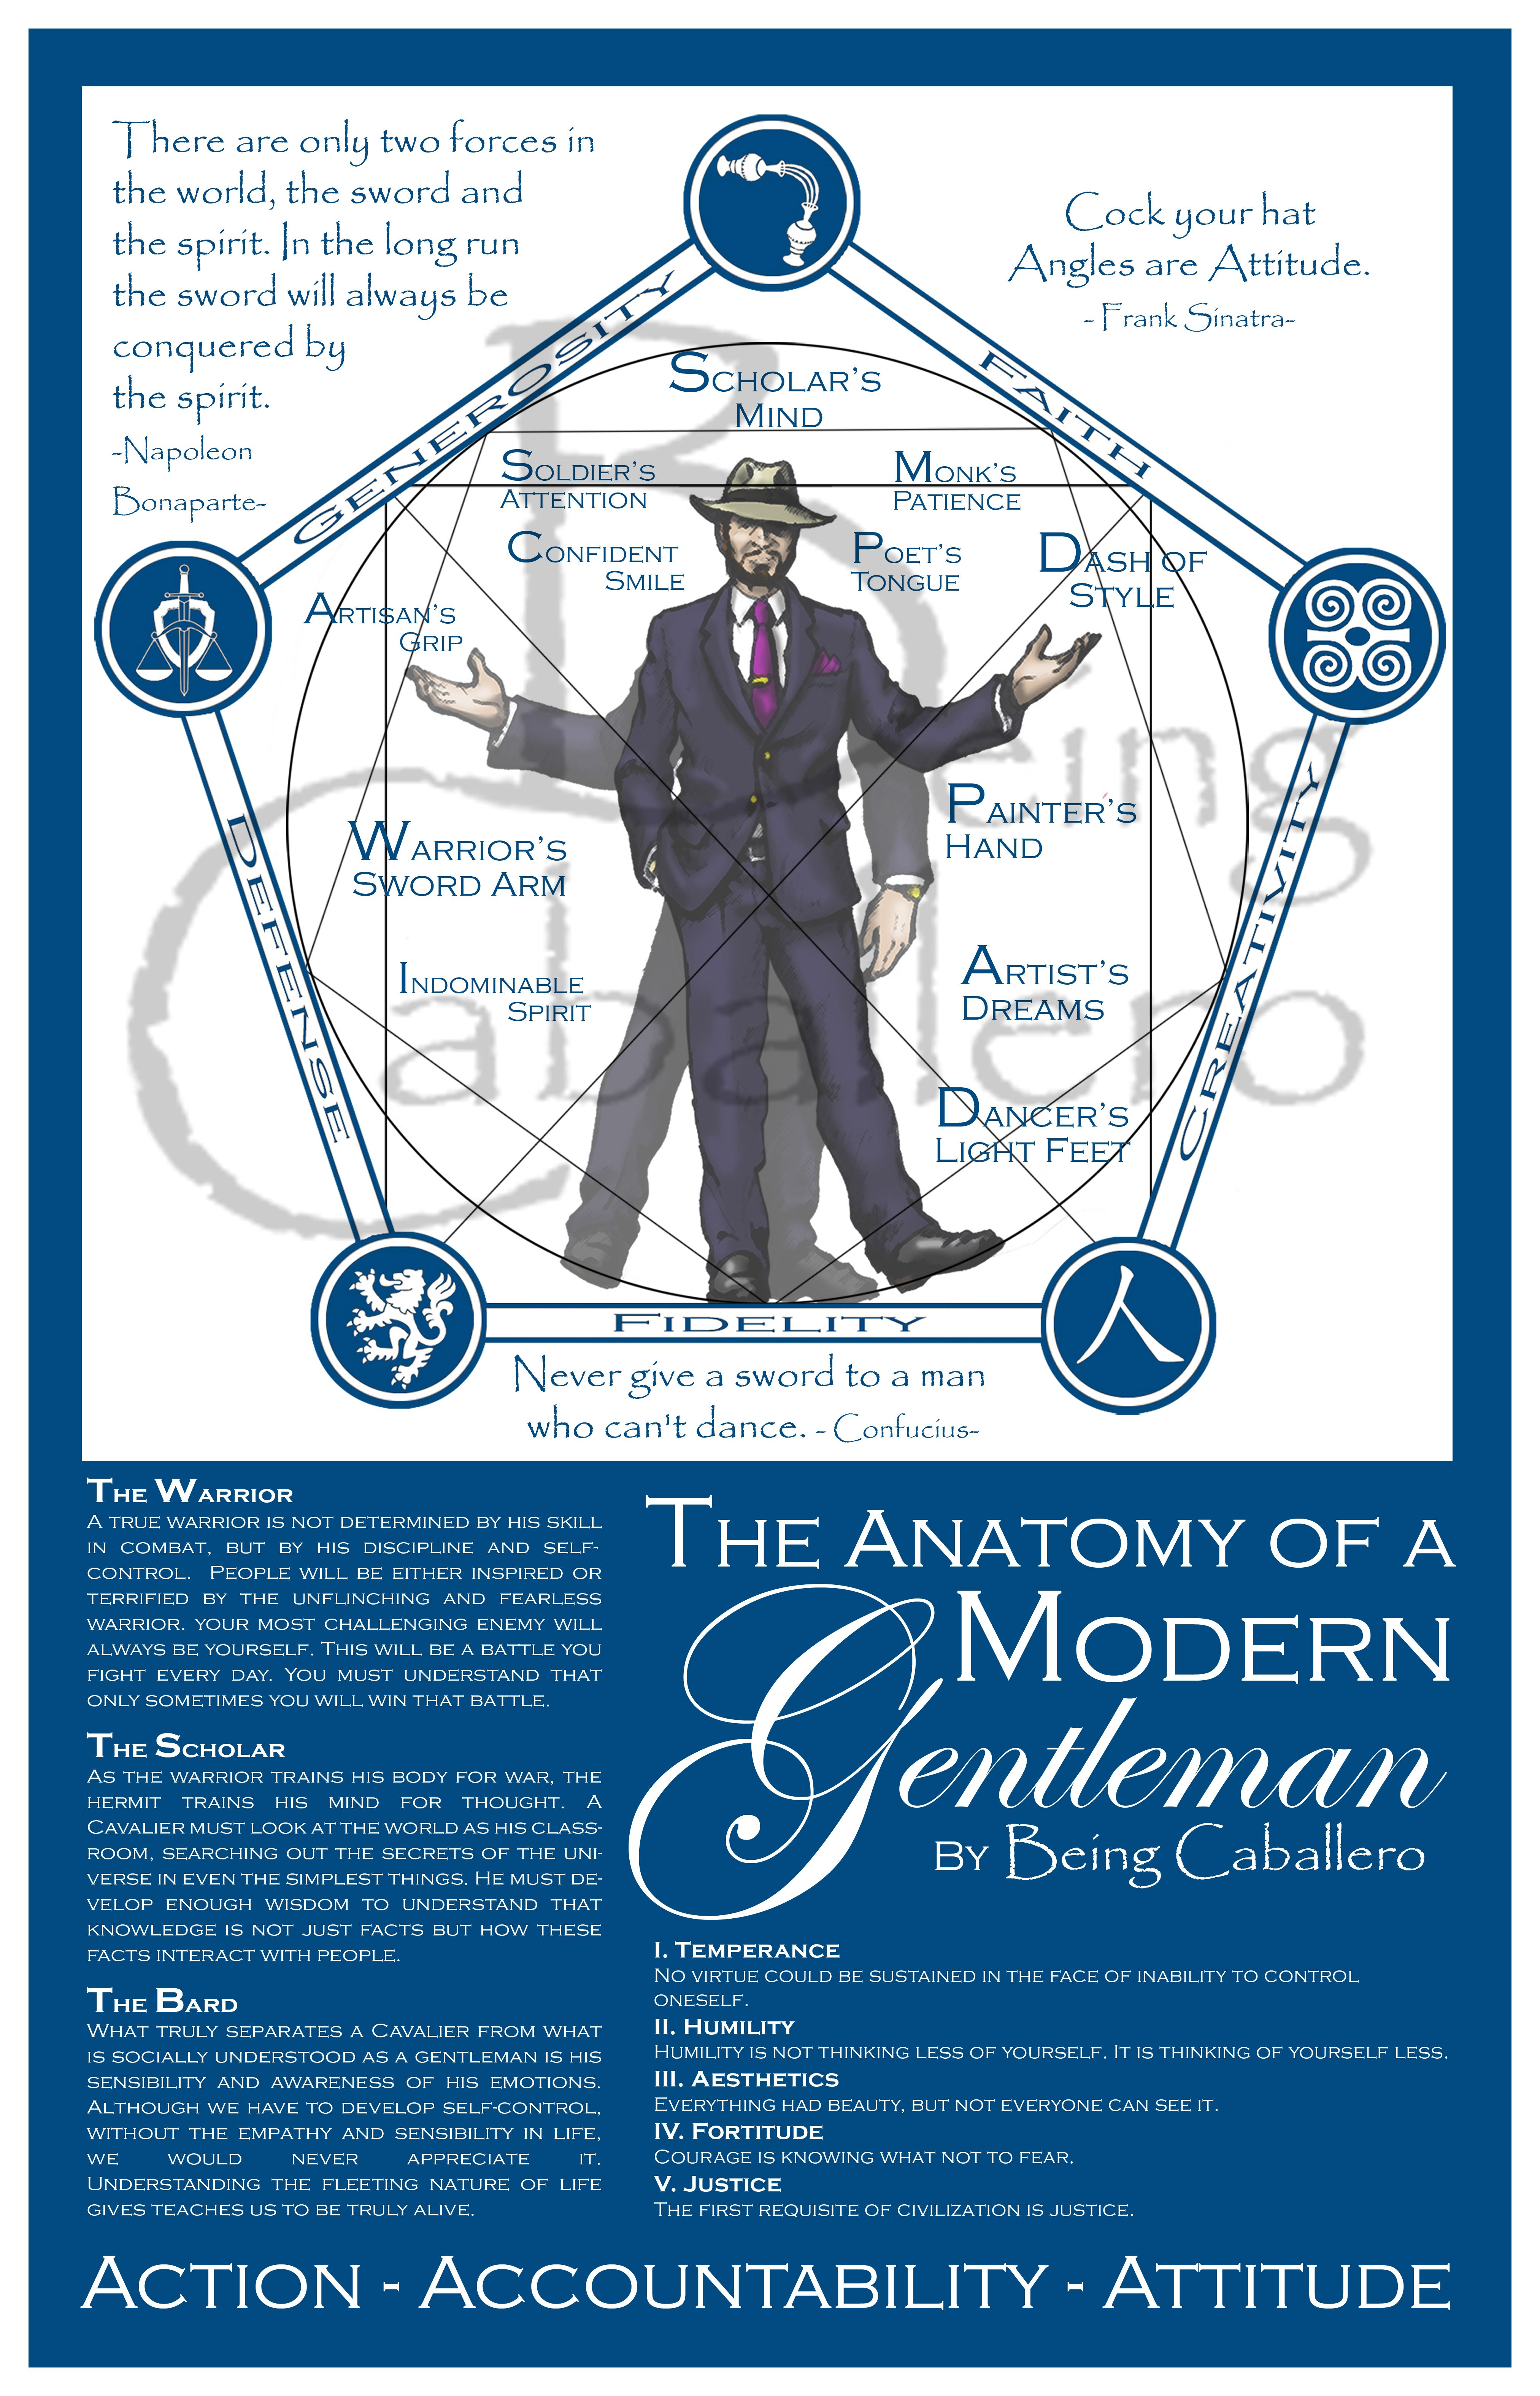 Anatomy of a Modern Gentleman. Work in progress. | Gentlemen ...